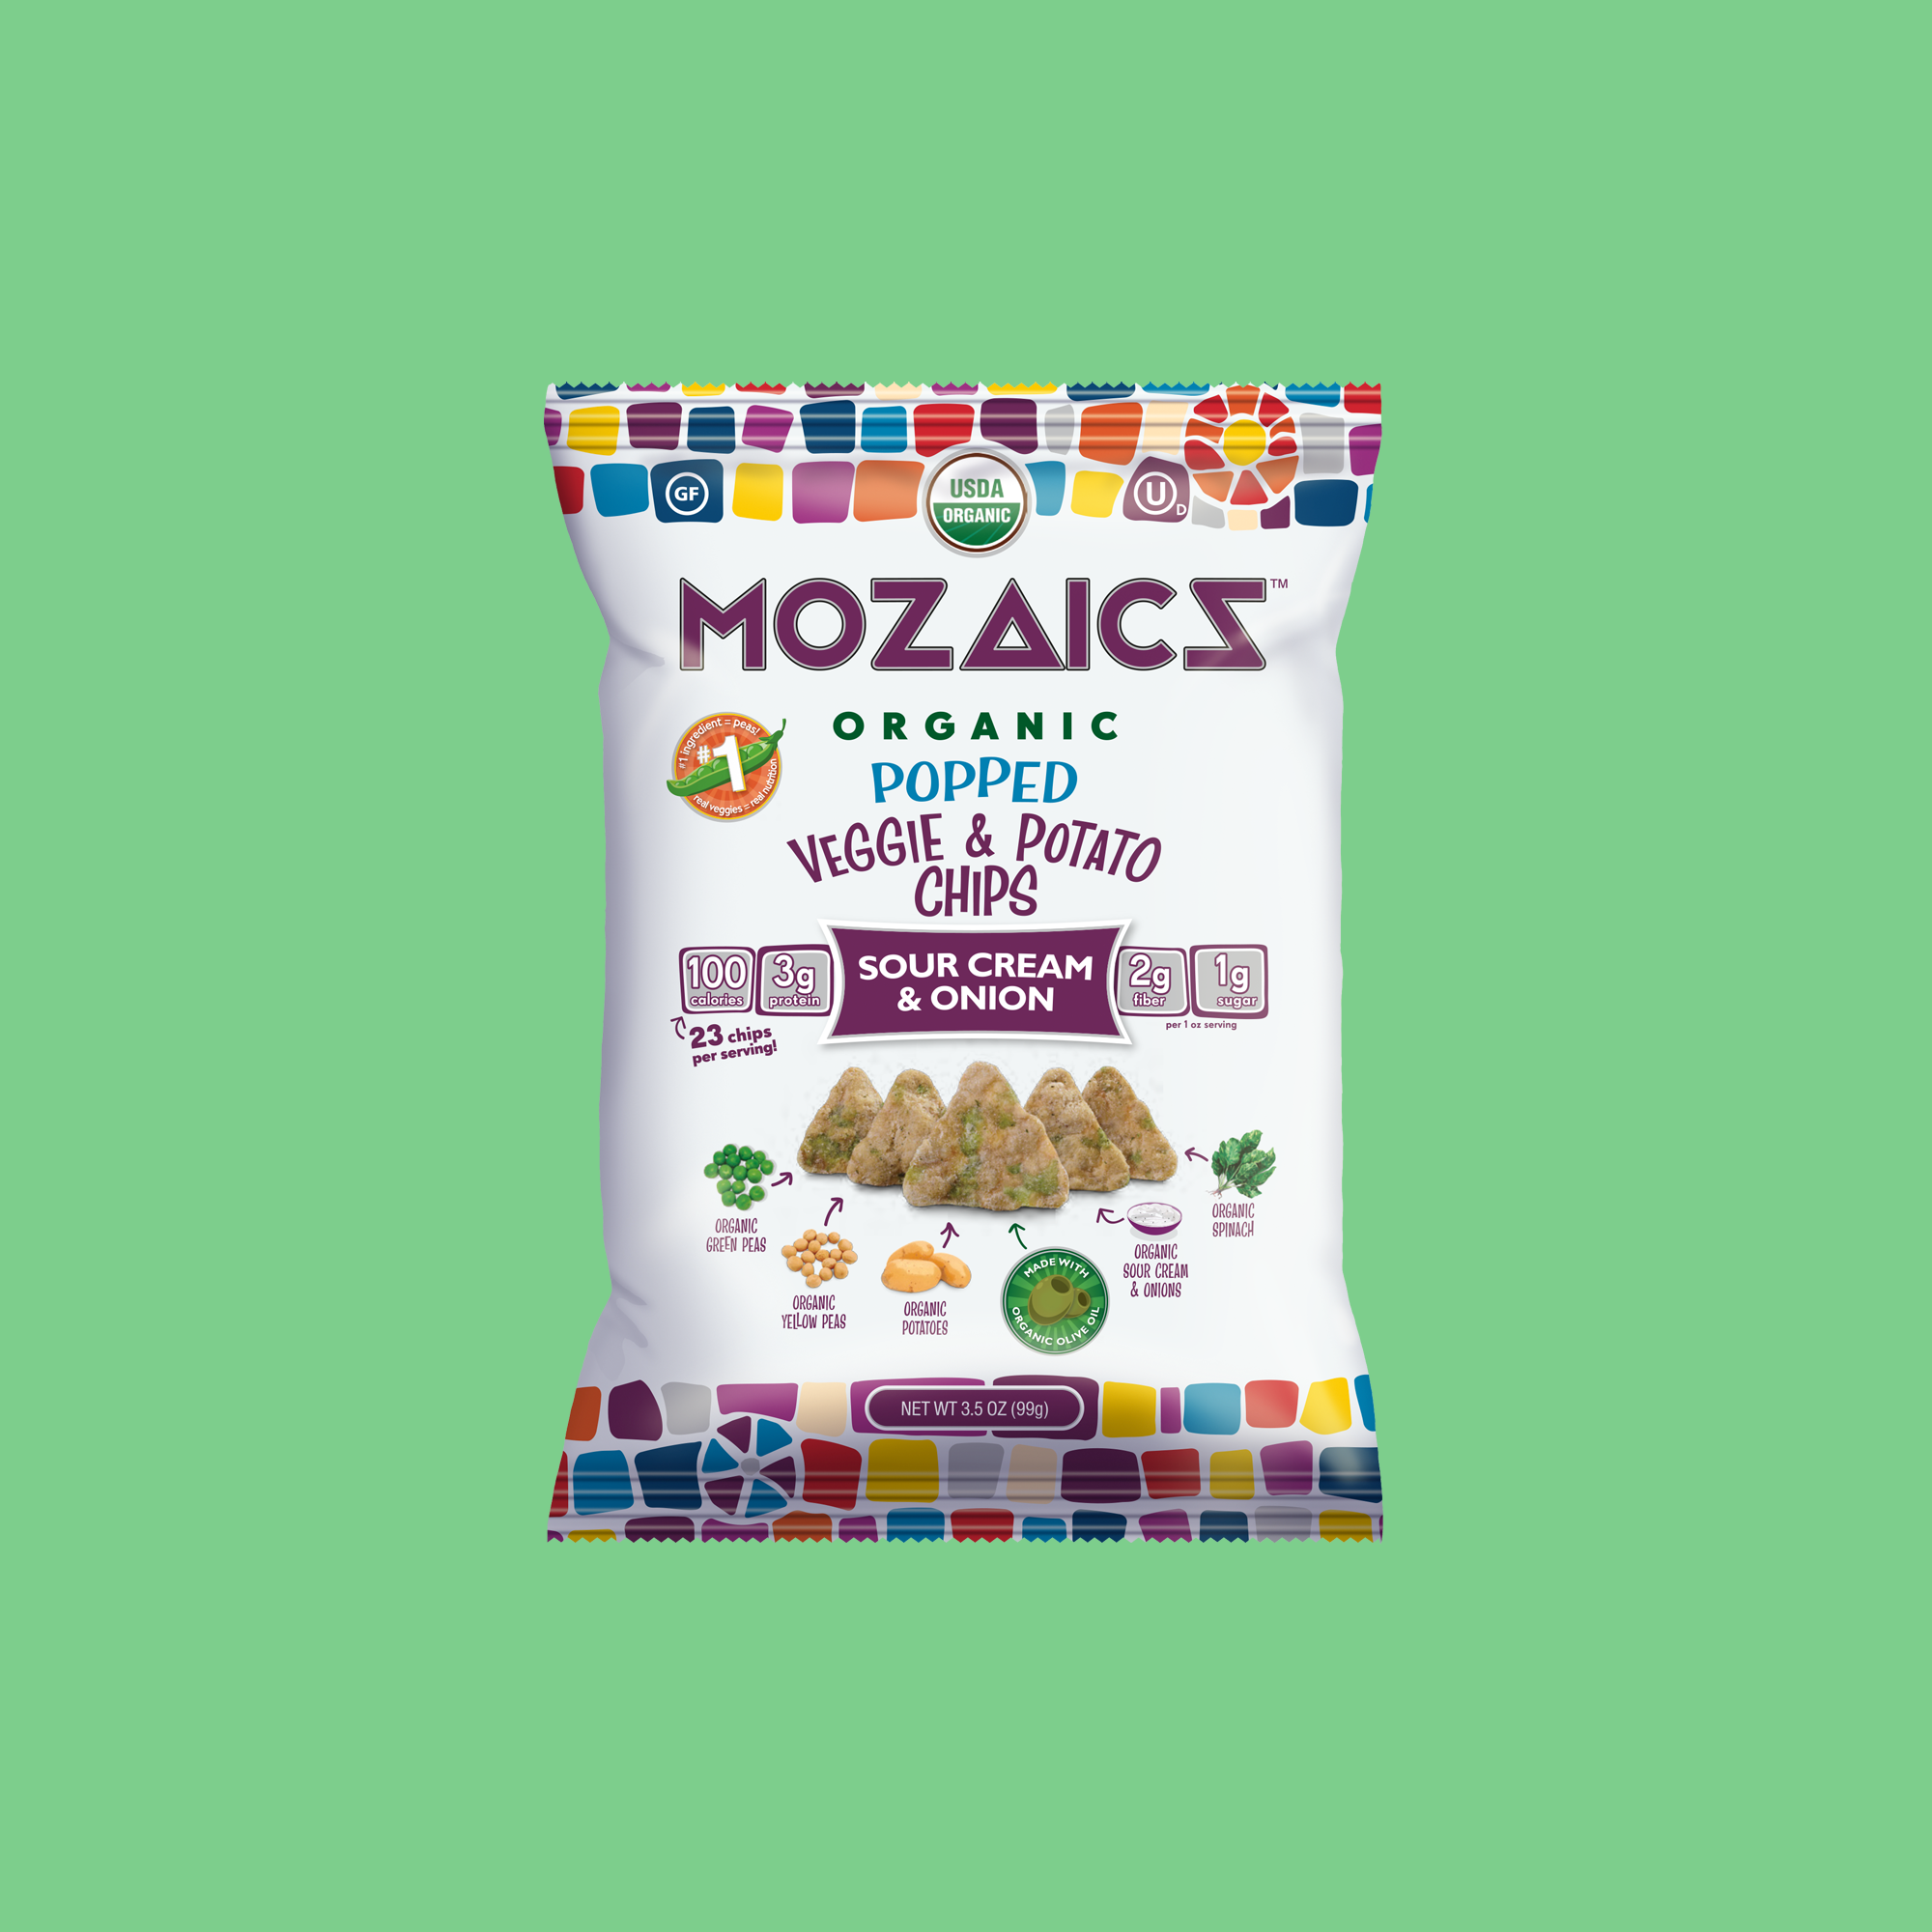 mozaic-seasalt-35oz-green.png